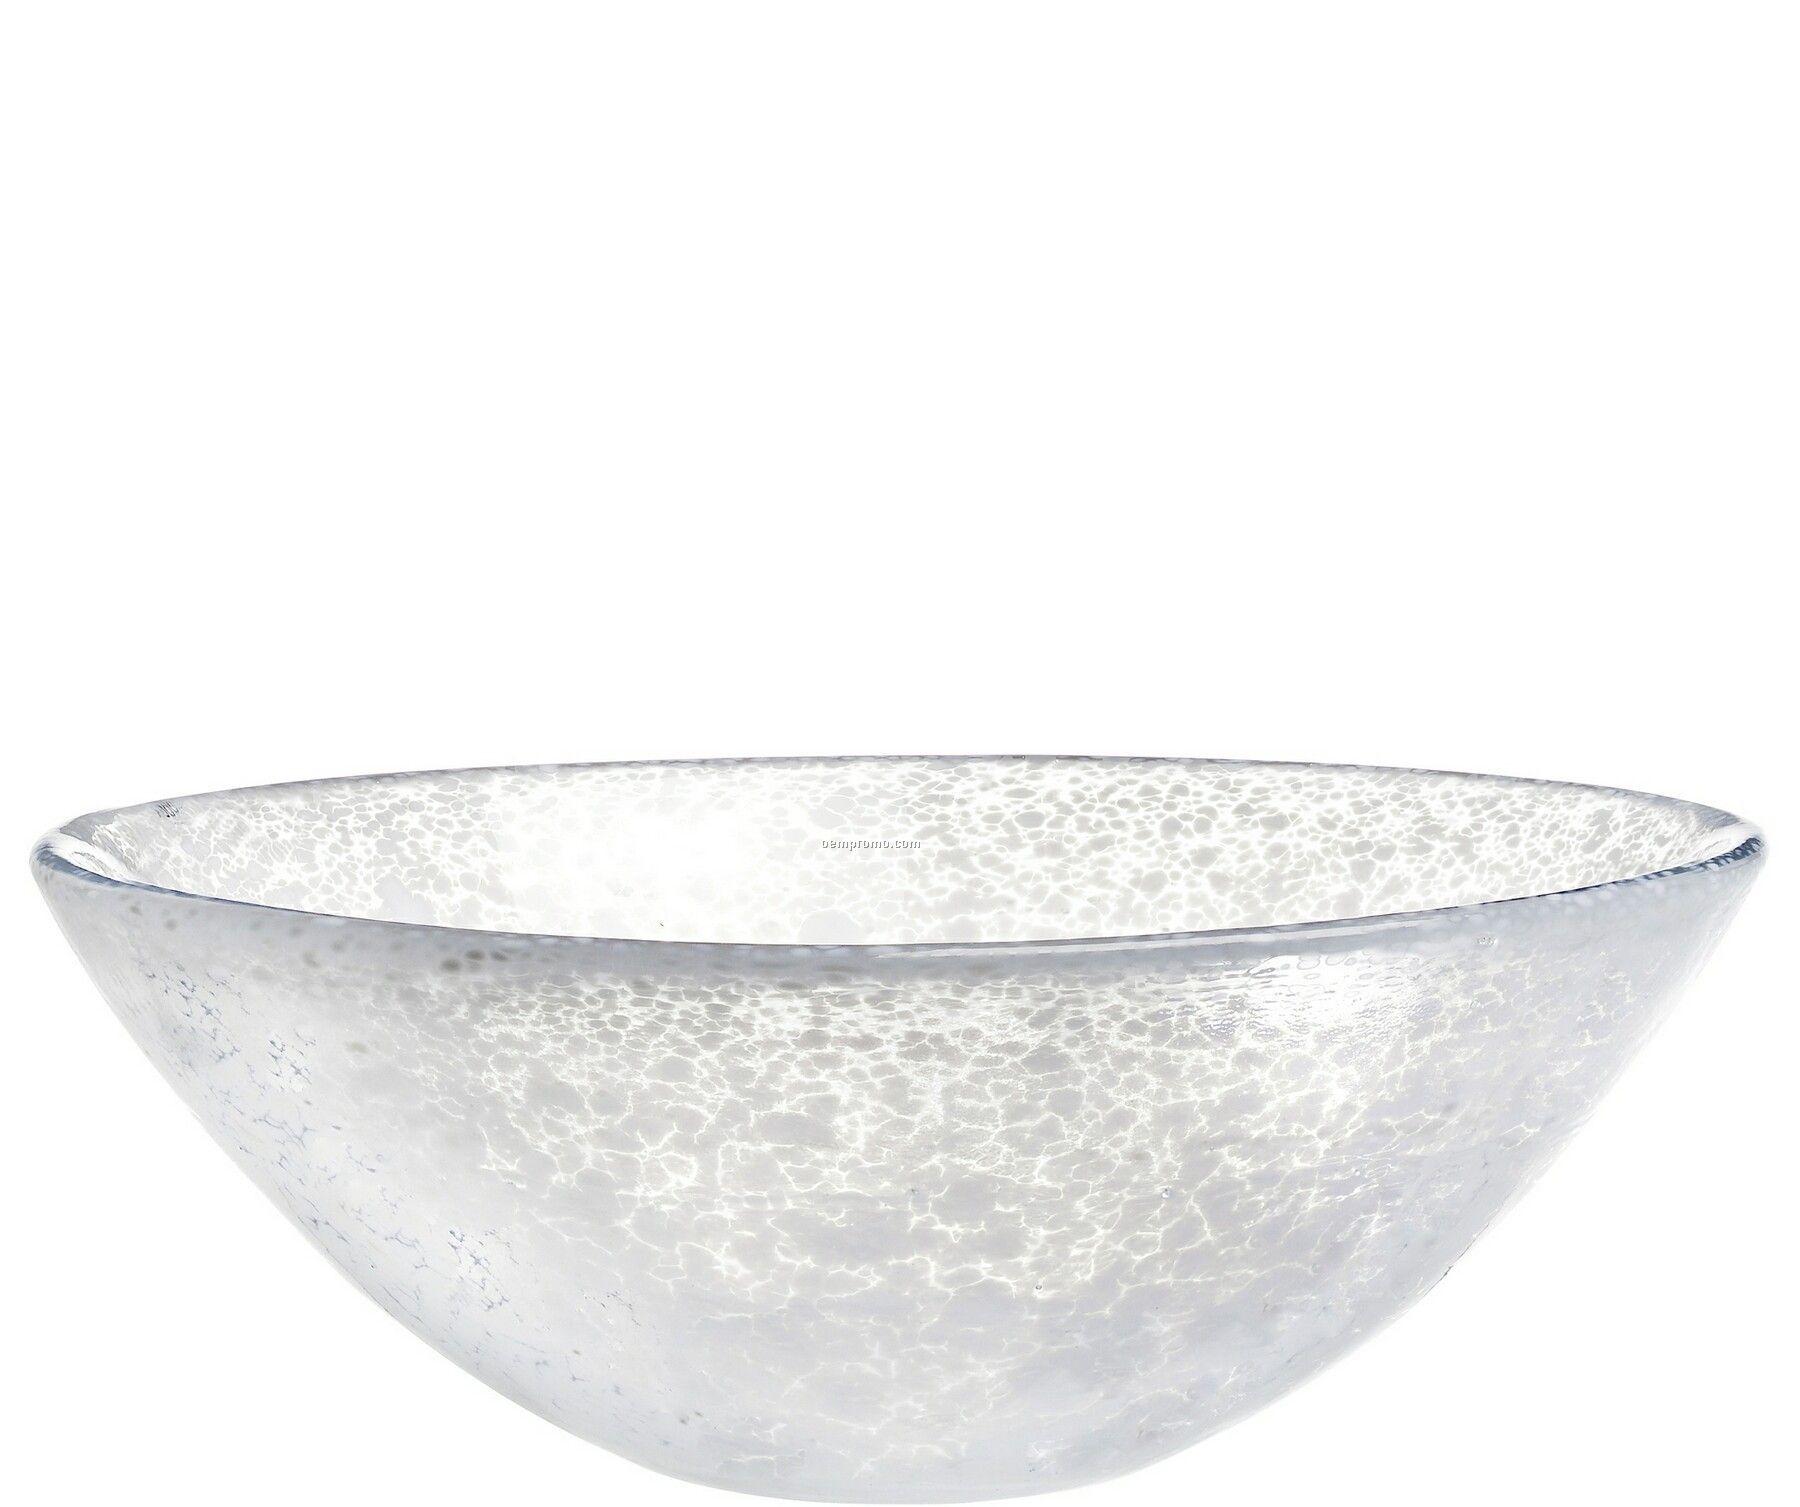 Tellus Large Glass Bowl By Anna Ehrner